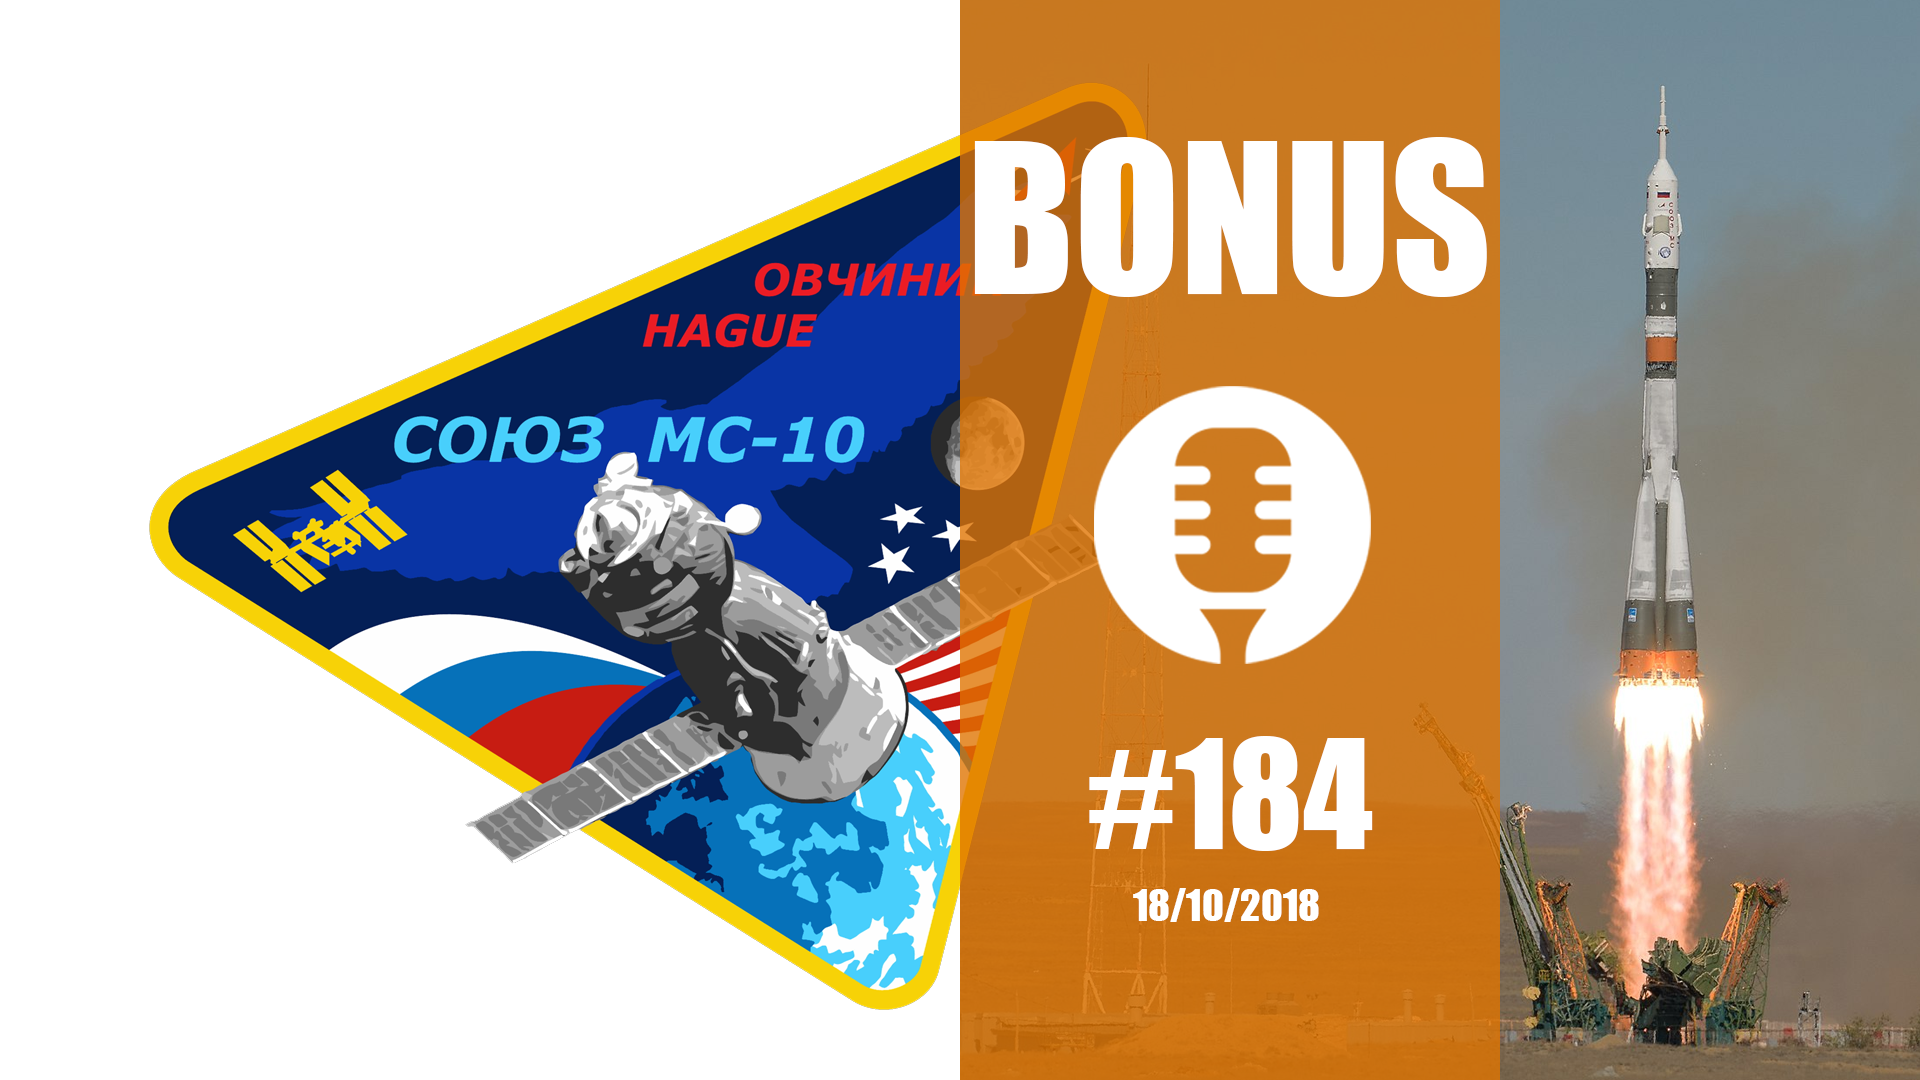 Bonus #184 : Echec de la mission Soyouz MS-10.